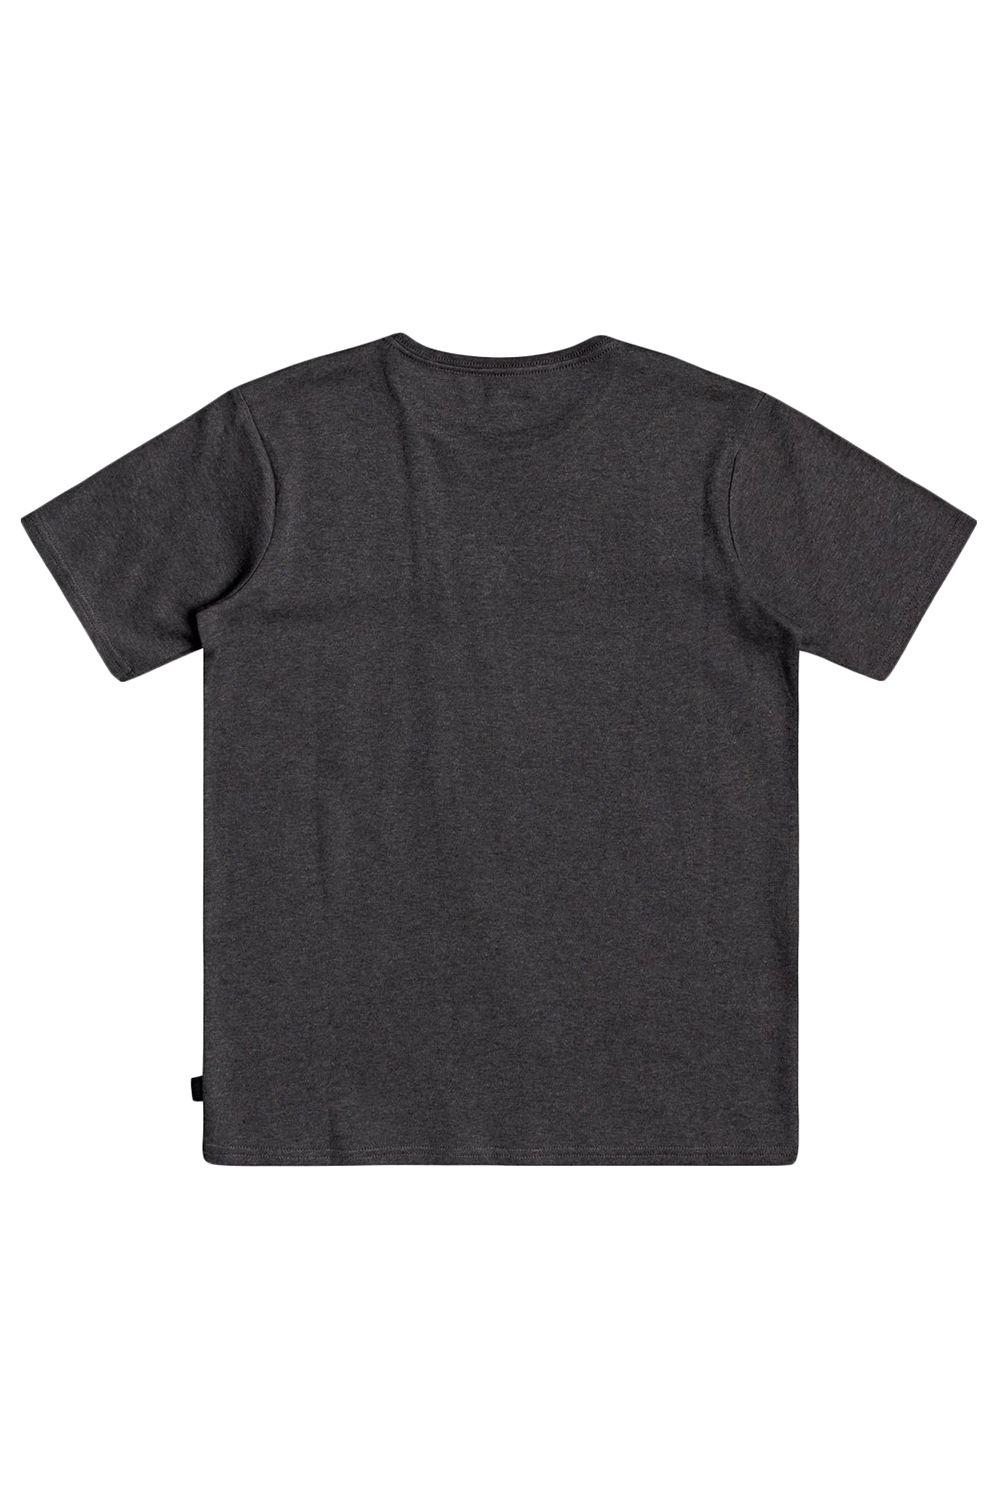 T-Shirt Quiksilver TROPICALSLANGSS B TEES Charcoal Heather